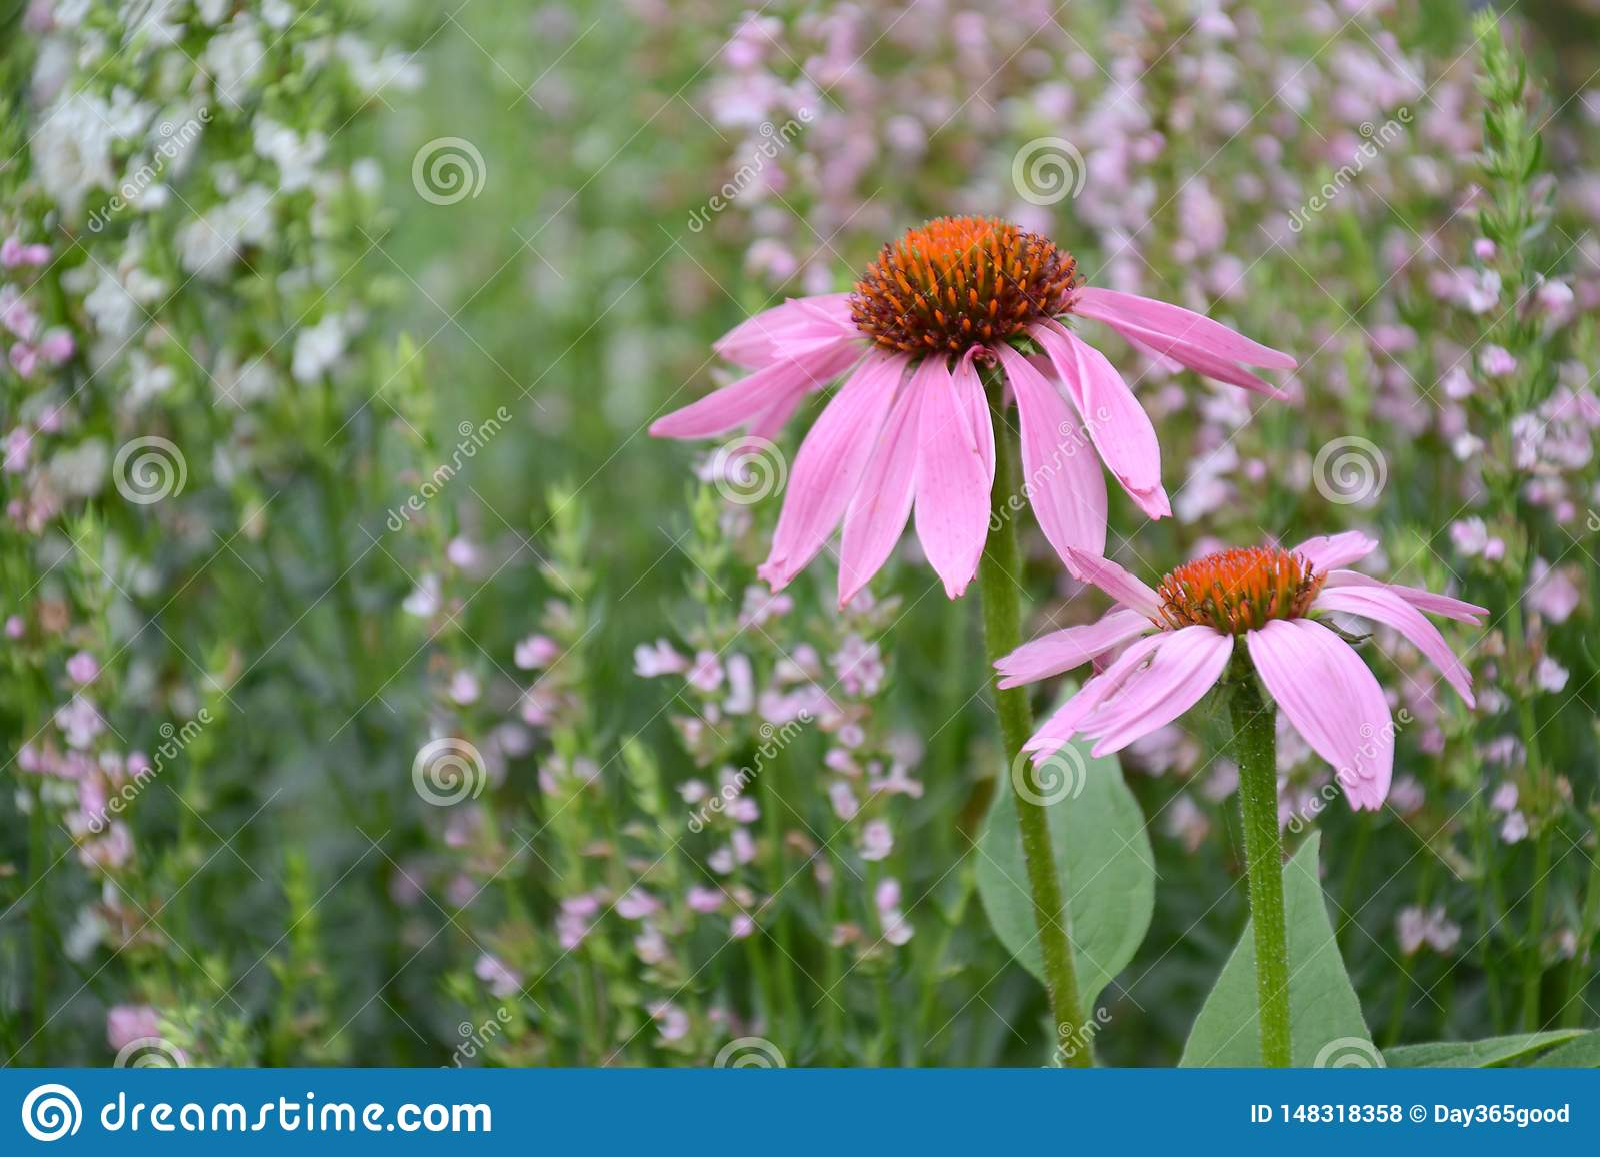 Echinacea και hyssop στο λιβάδι Θεραπεύοντας χορτάρια Ιατρικές εγκαταστάσεις και λουλούδια Μειλίχιος